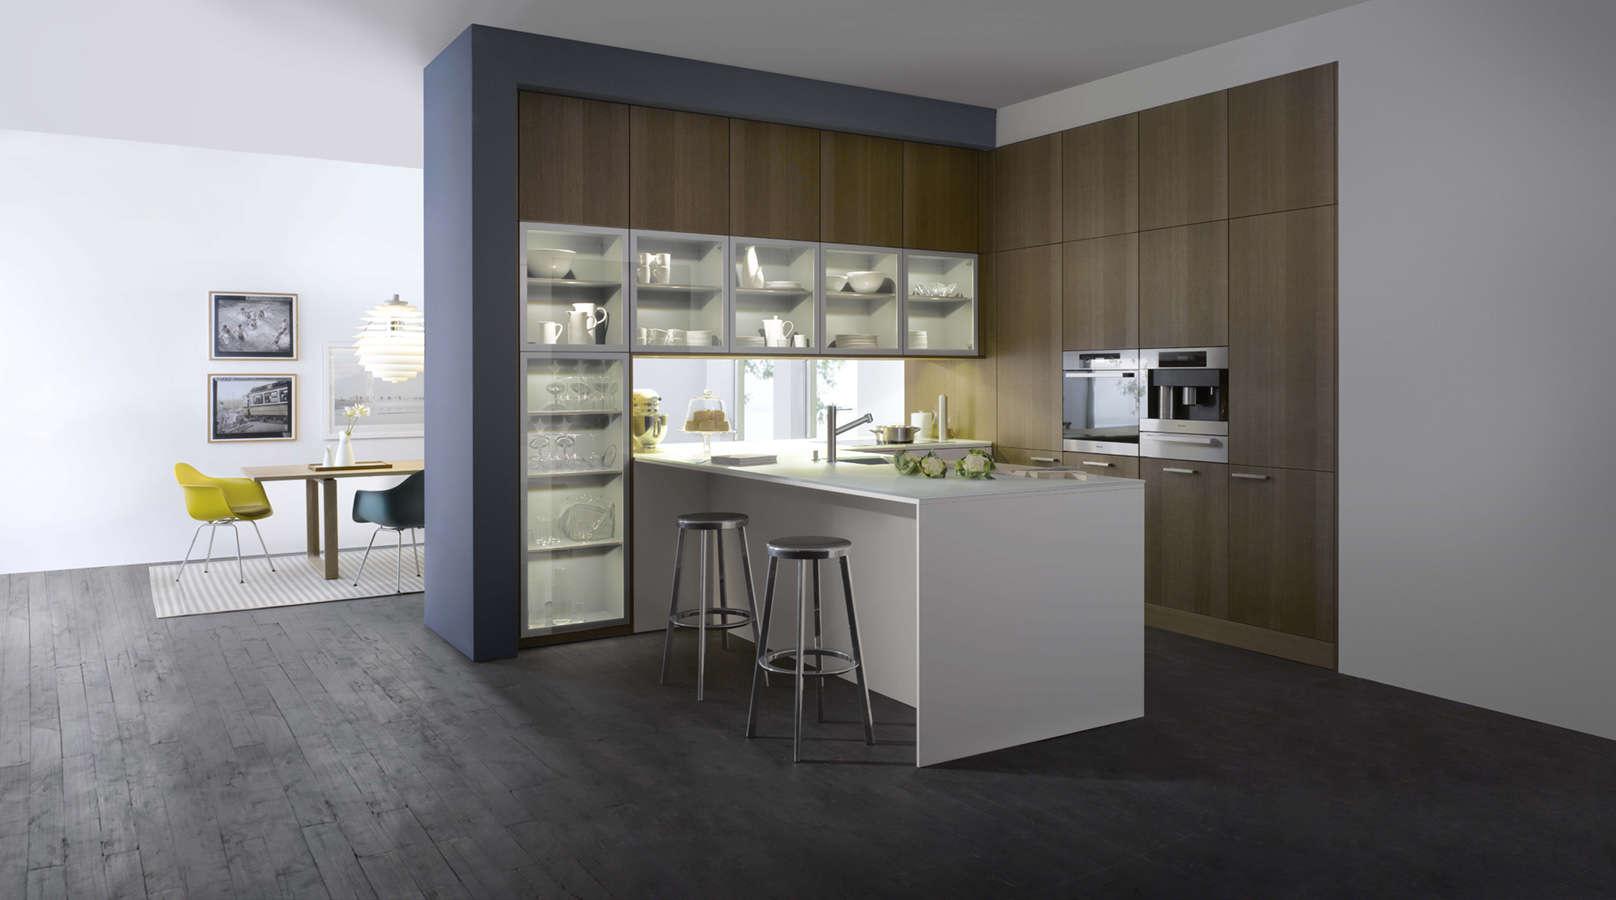 Design keuken vol opbergruimte